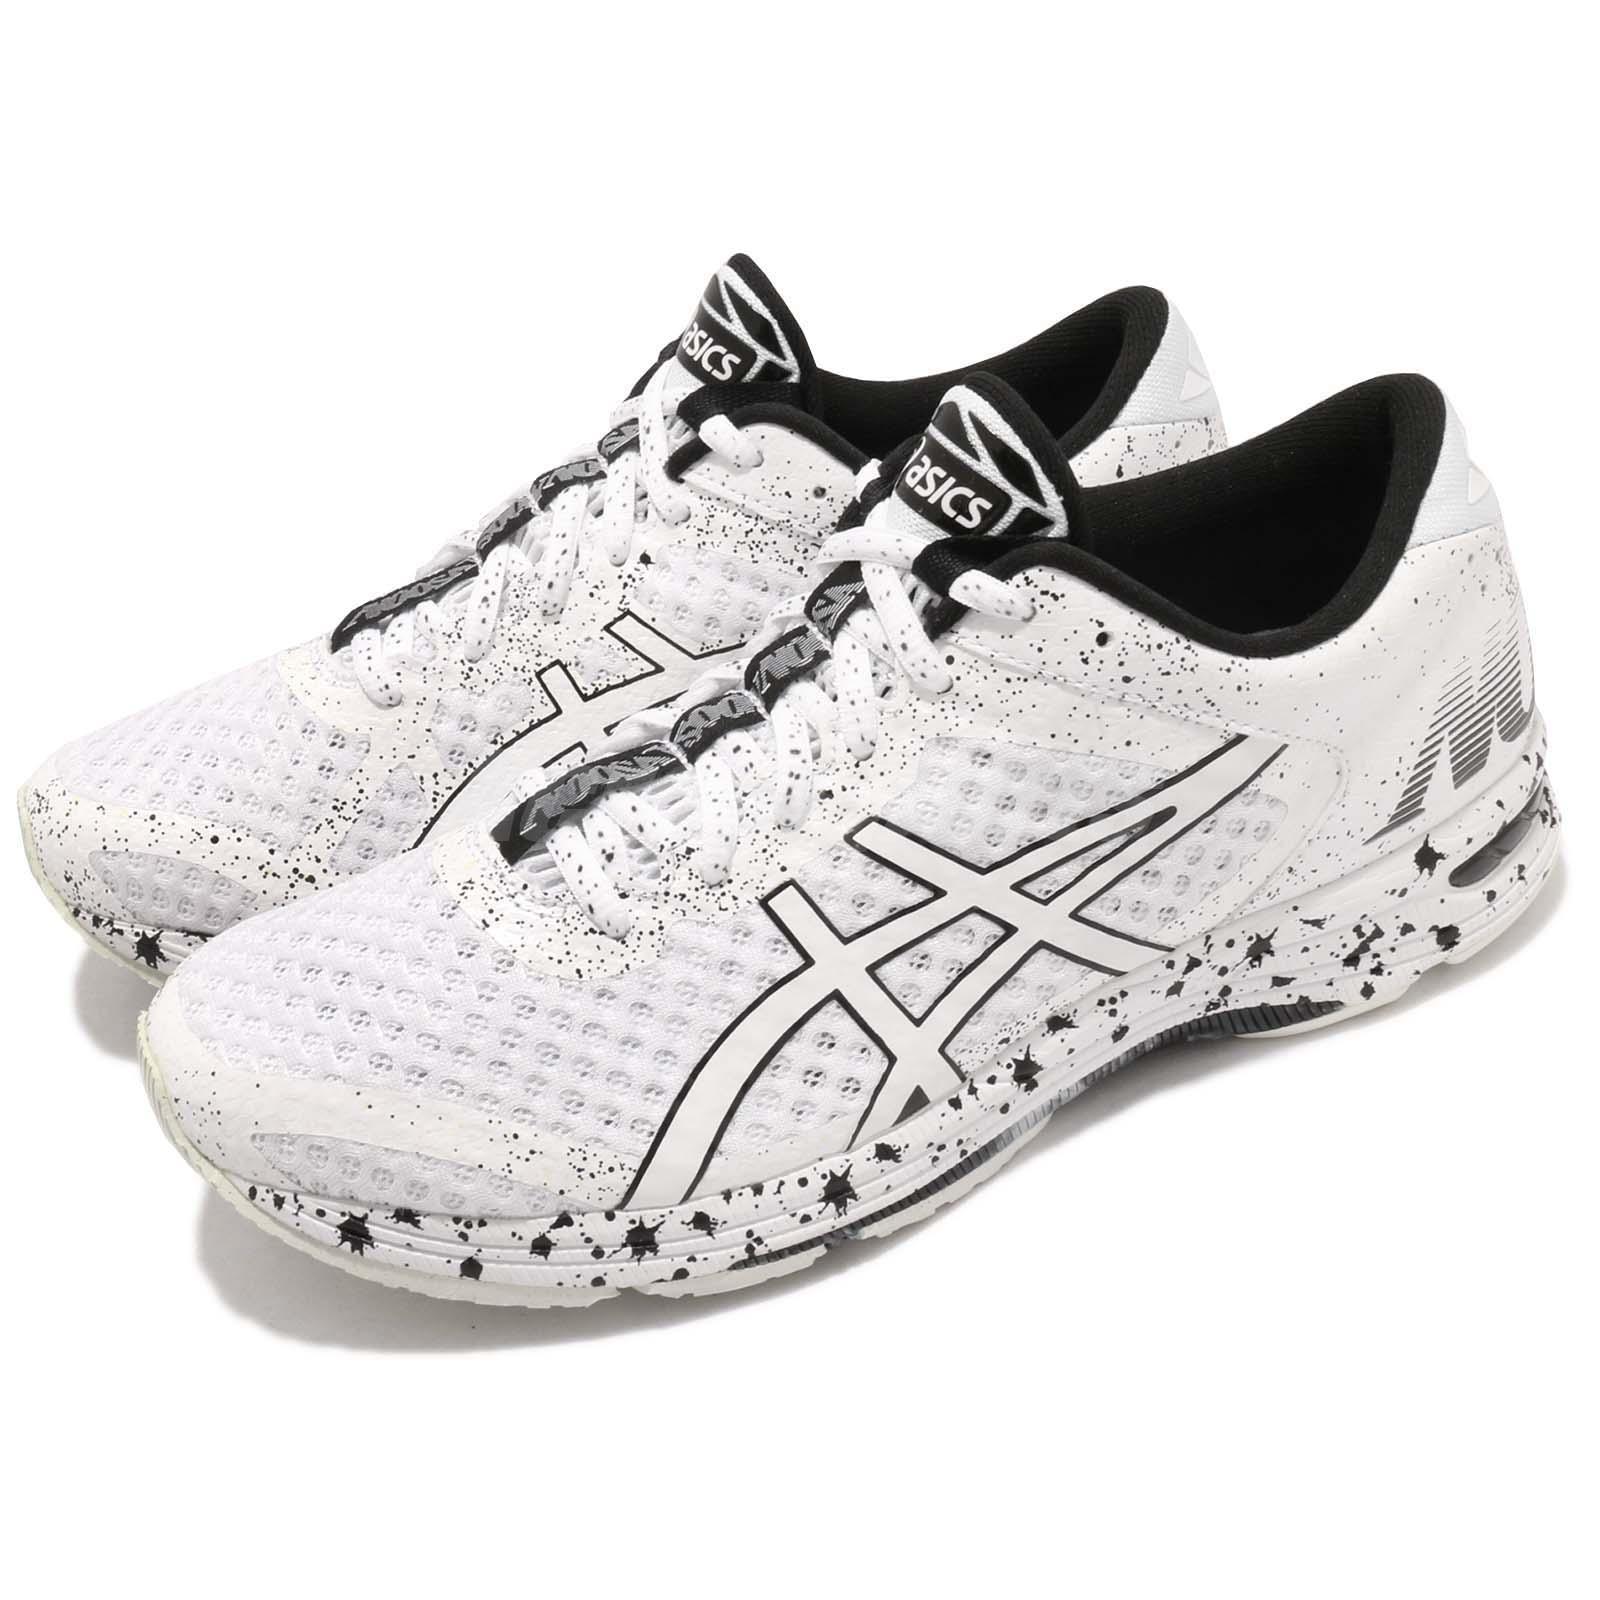 low priced 6a461 61e52 Details about Asics Gel-Noosa TRI 11 White Black Men Triathlon Running Shoe  Sneaker T626Q-0101